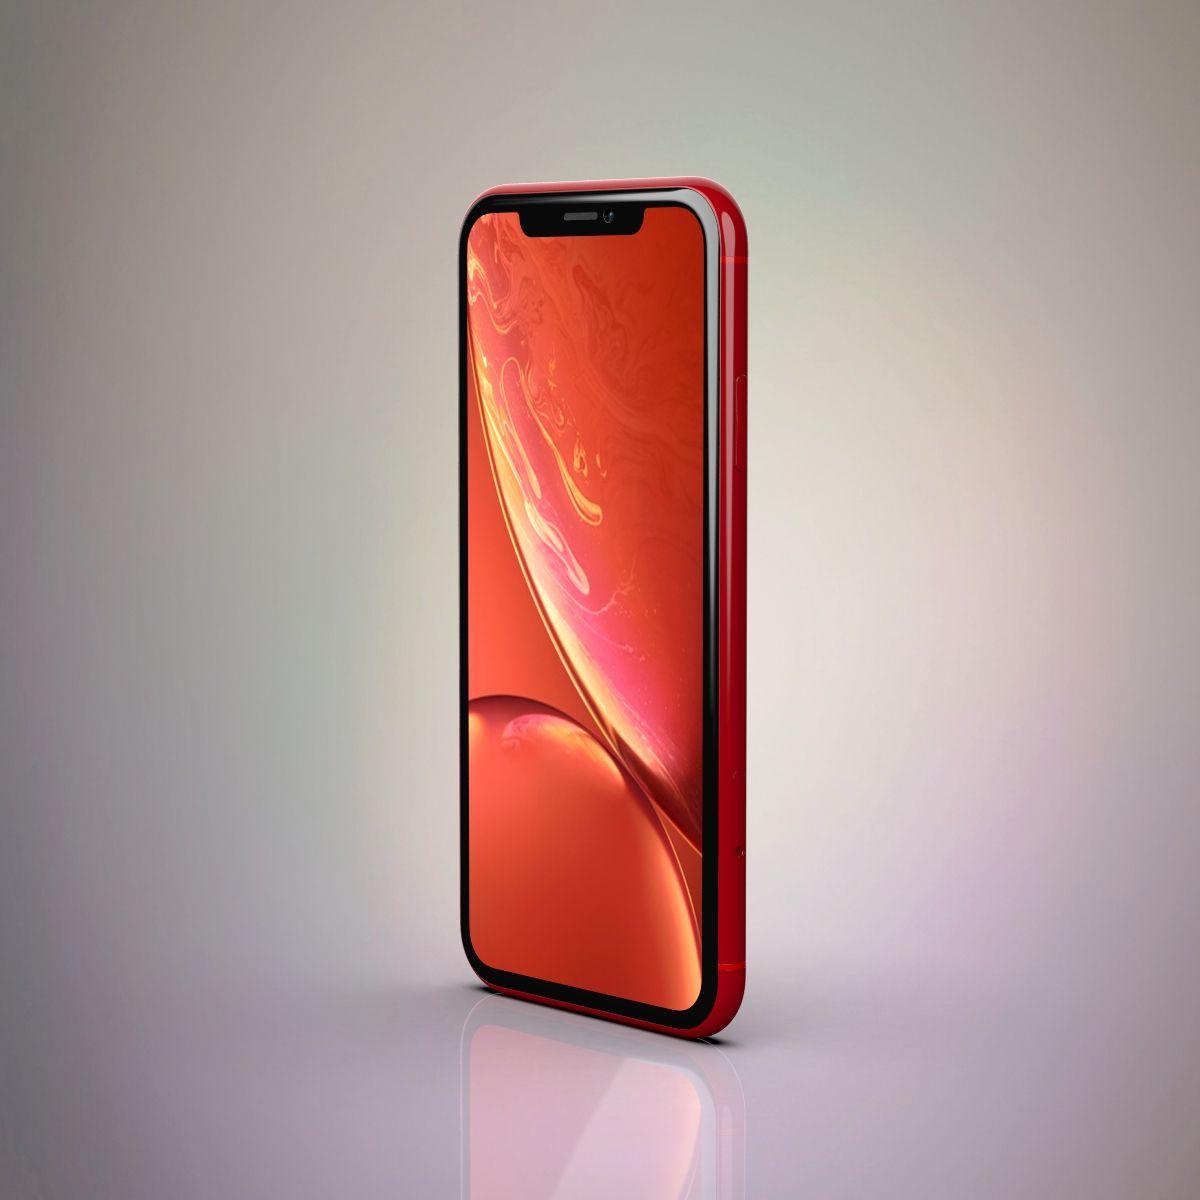 Iphone Xr Iphone Ads Creative Buy Iphone